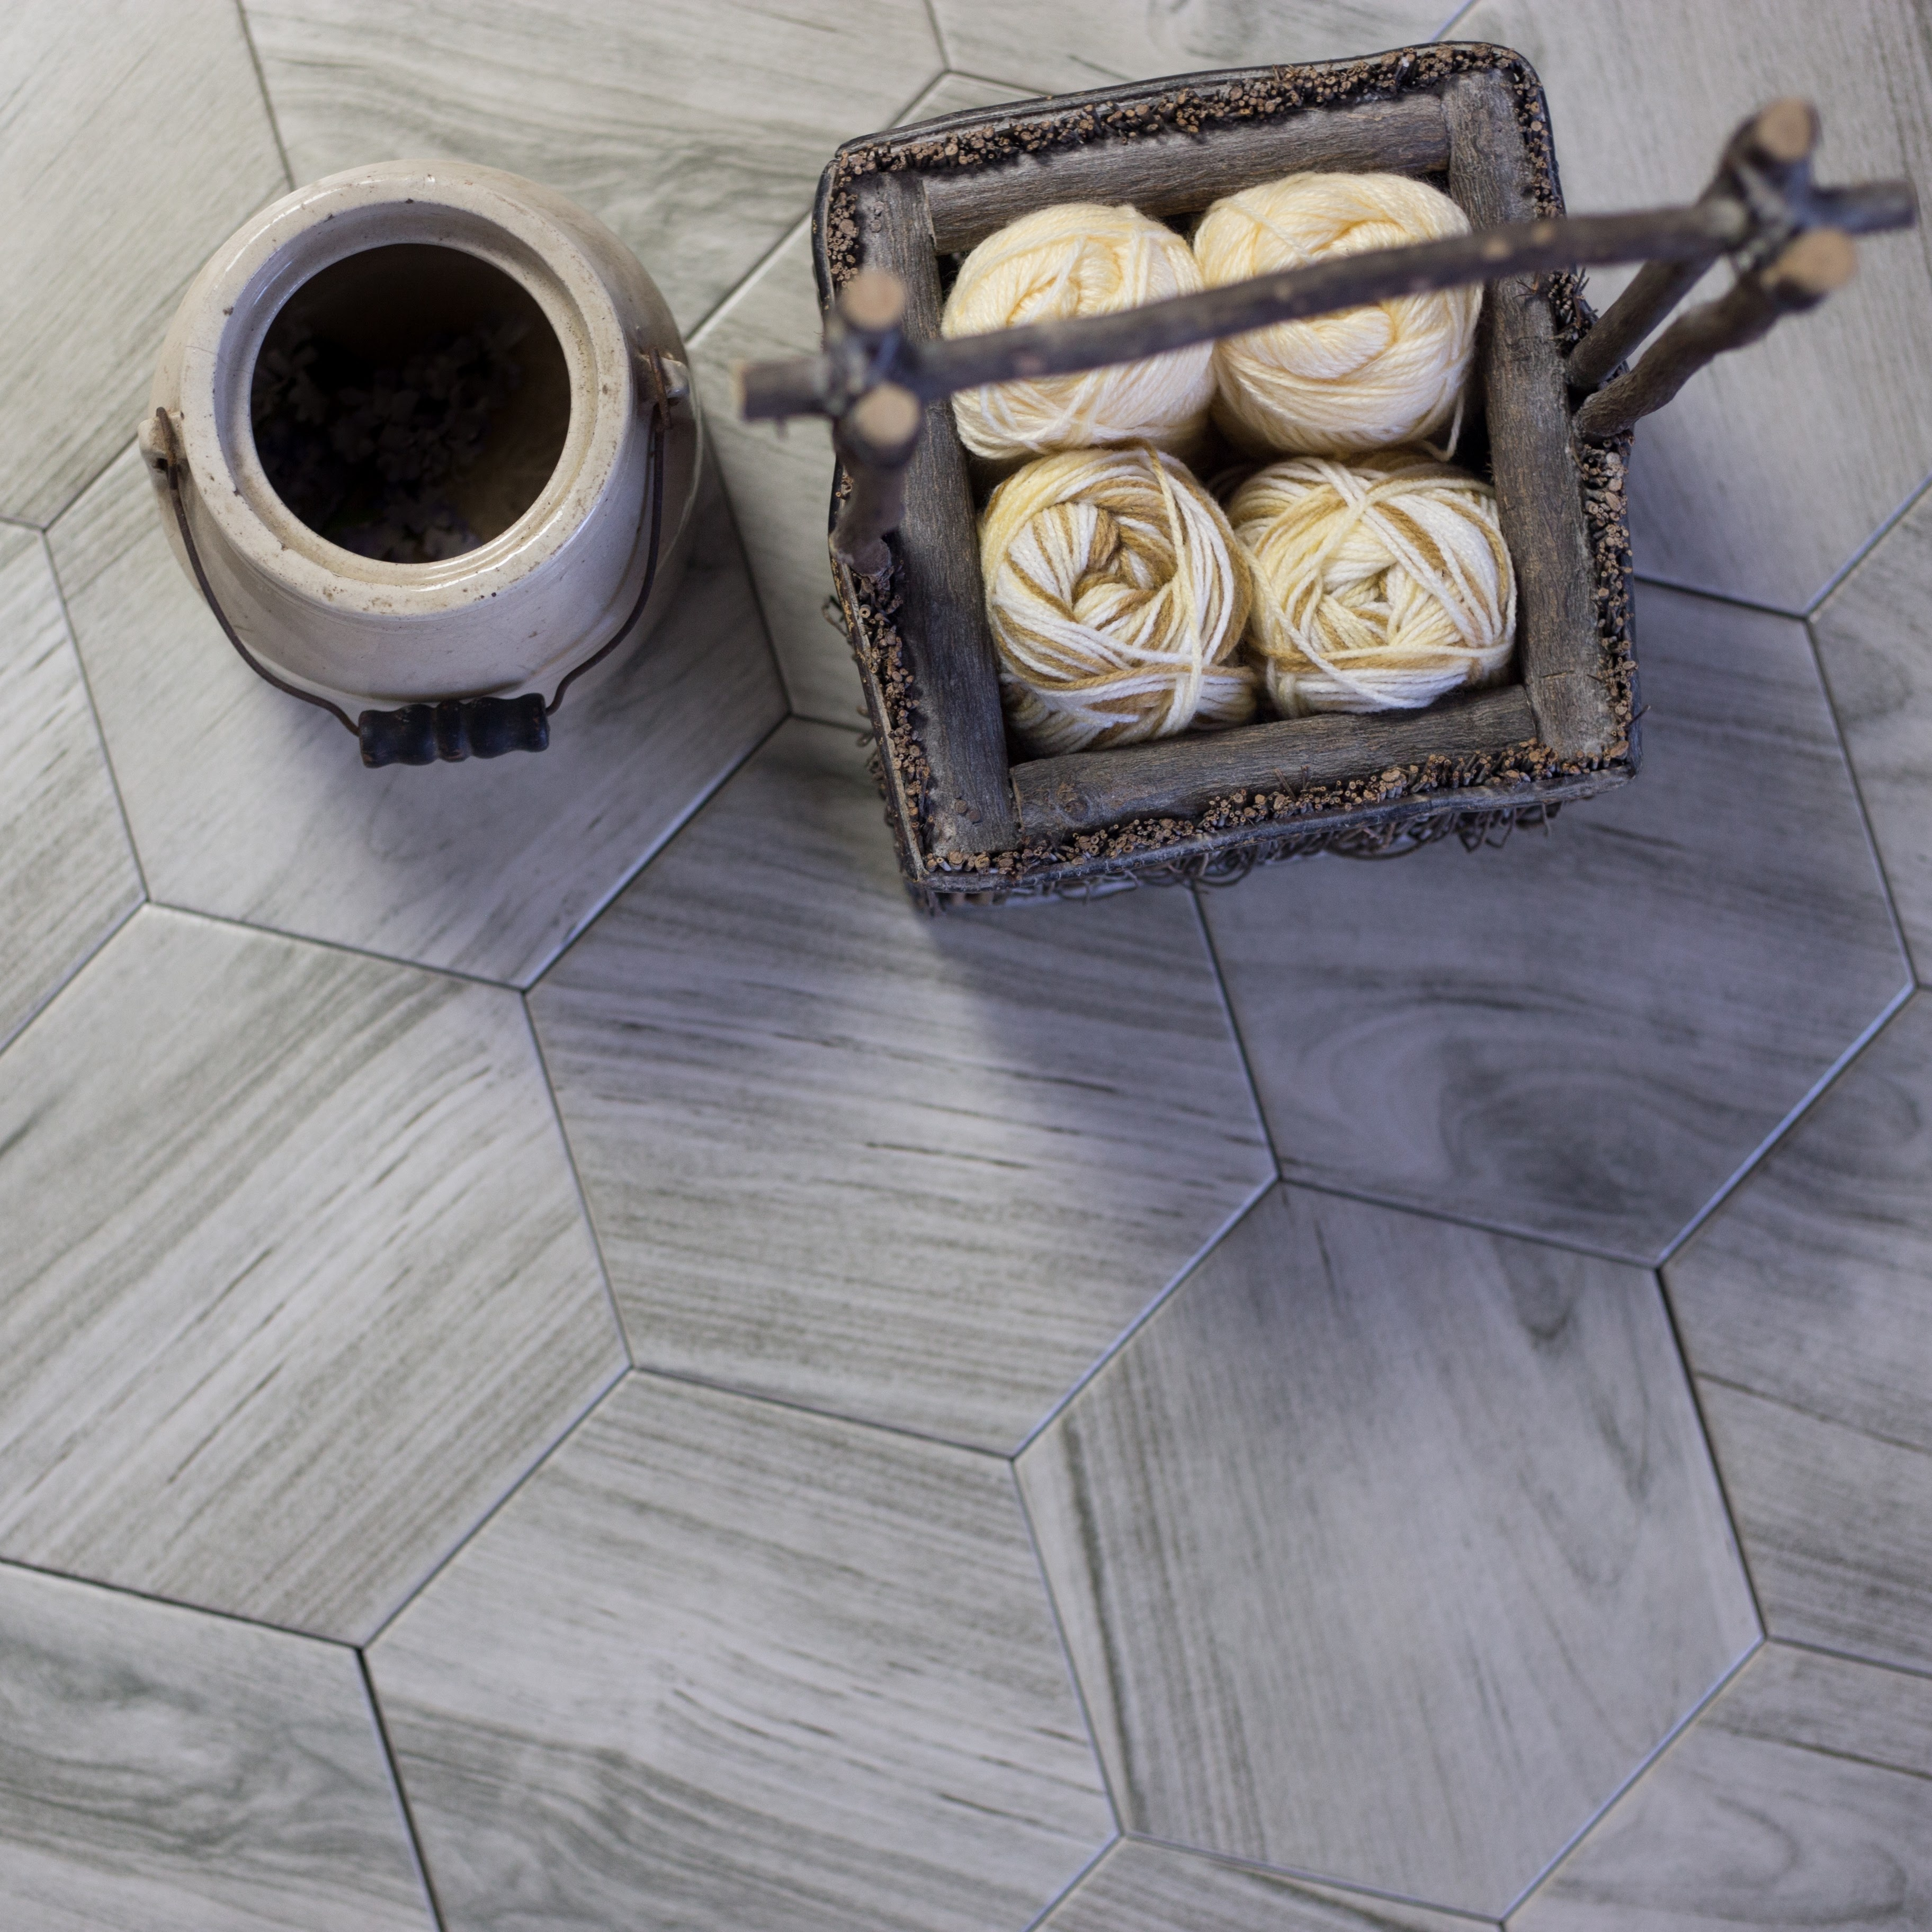 Artisan Wood 8 X 8 Ceramic Hexagon Wood Look Tile In Smoke Gray